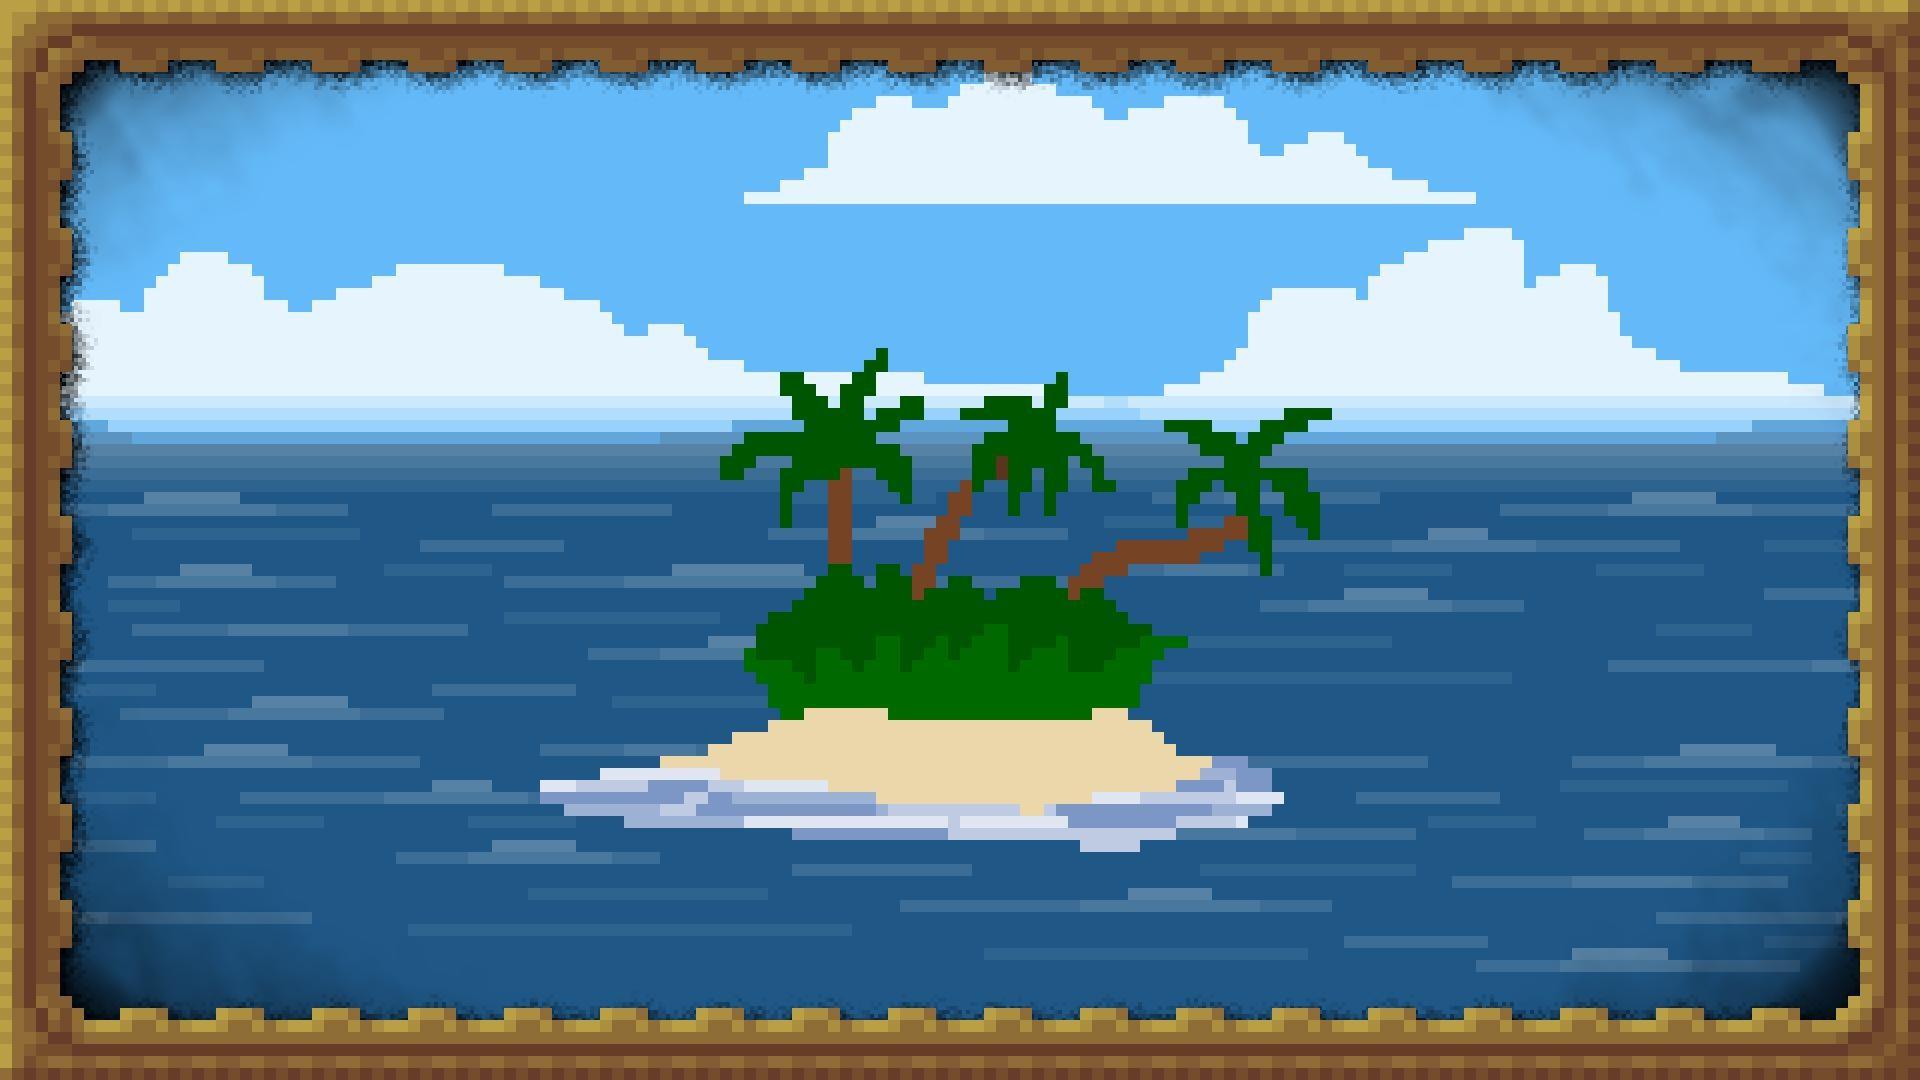 Sfondi illustrazione arte digitale mare pixel art for Koch auf englisch